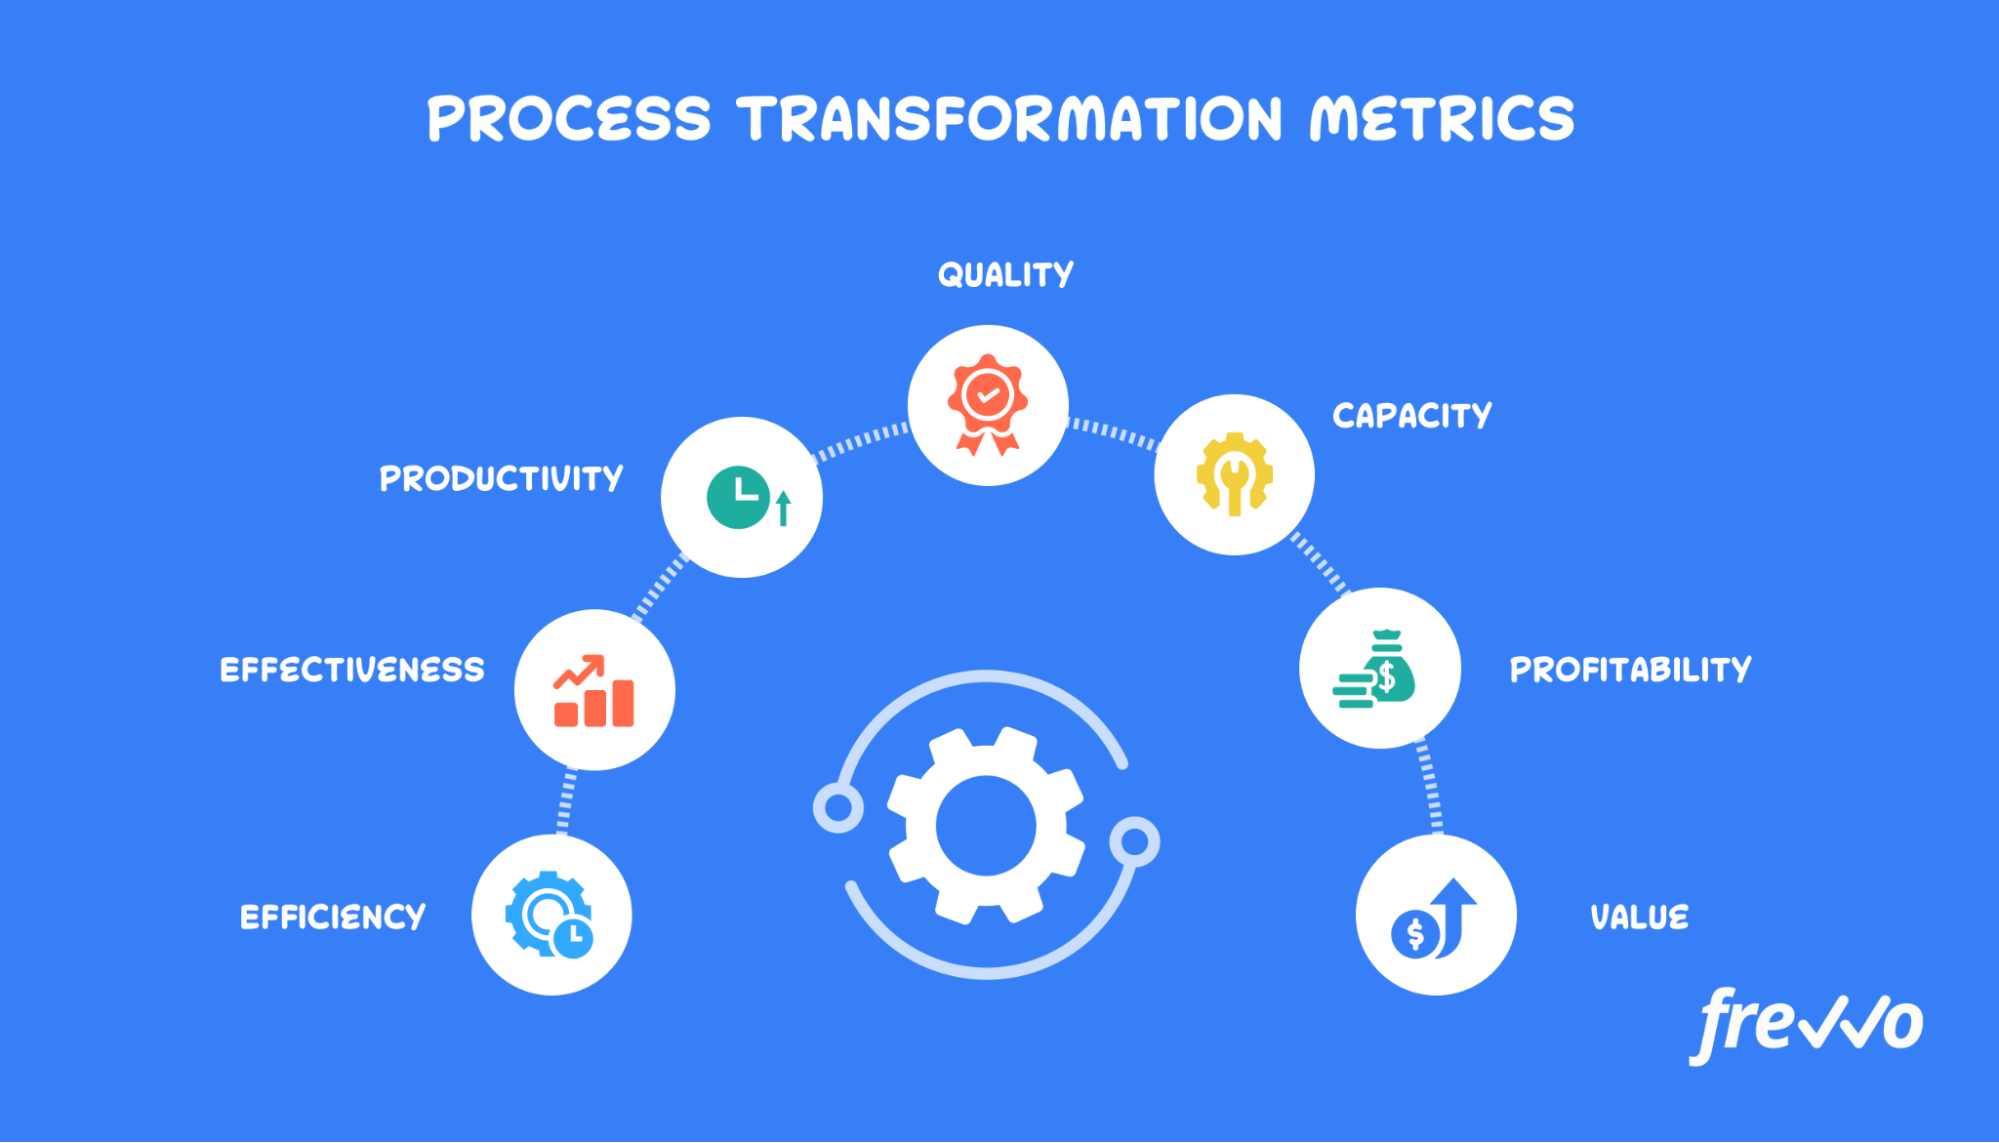 metrics for process transformation